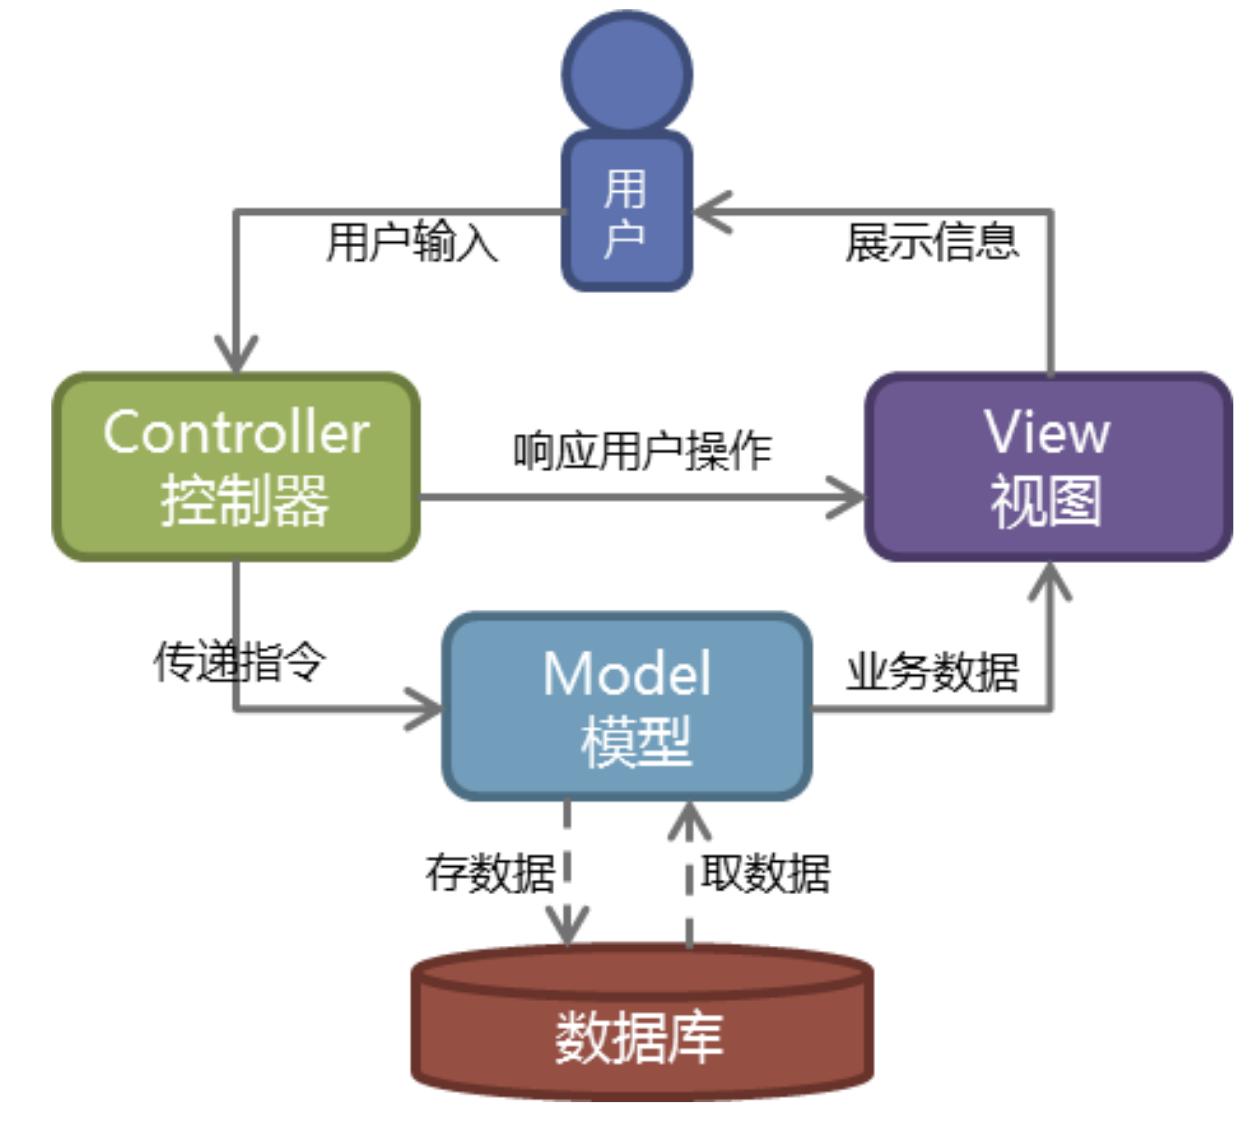 dya49:django:wsgrief&模板渲染Jinjia2&django的MTV/MVC框架&创建/启动一个django项目